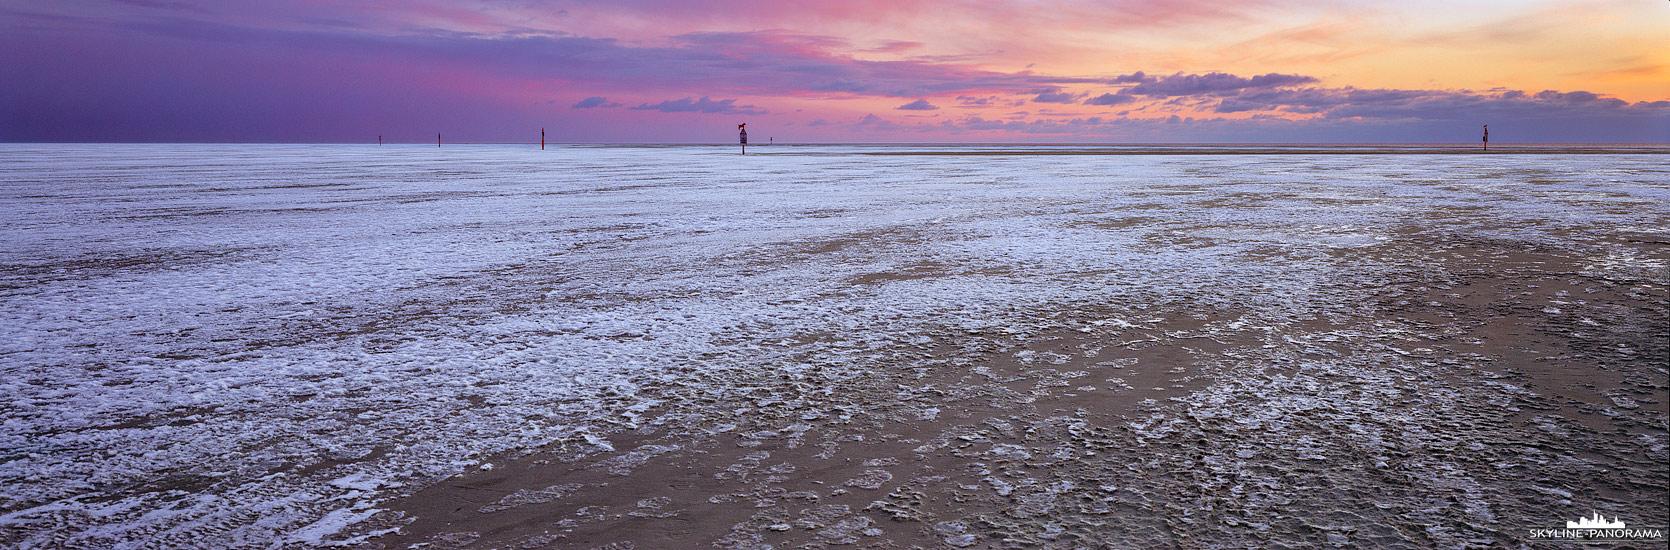 Wattenmeer im Winter zum Sonnenuntergang (p_01169)